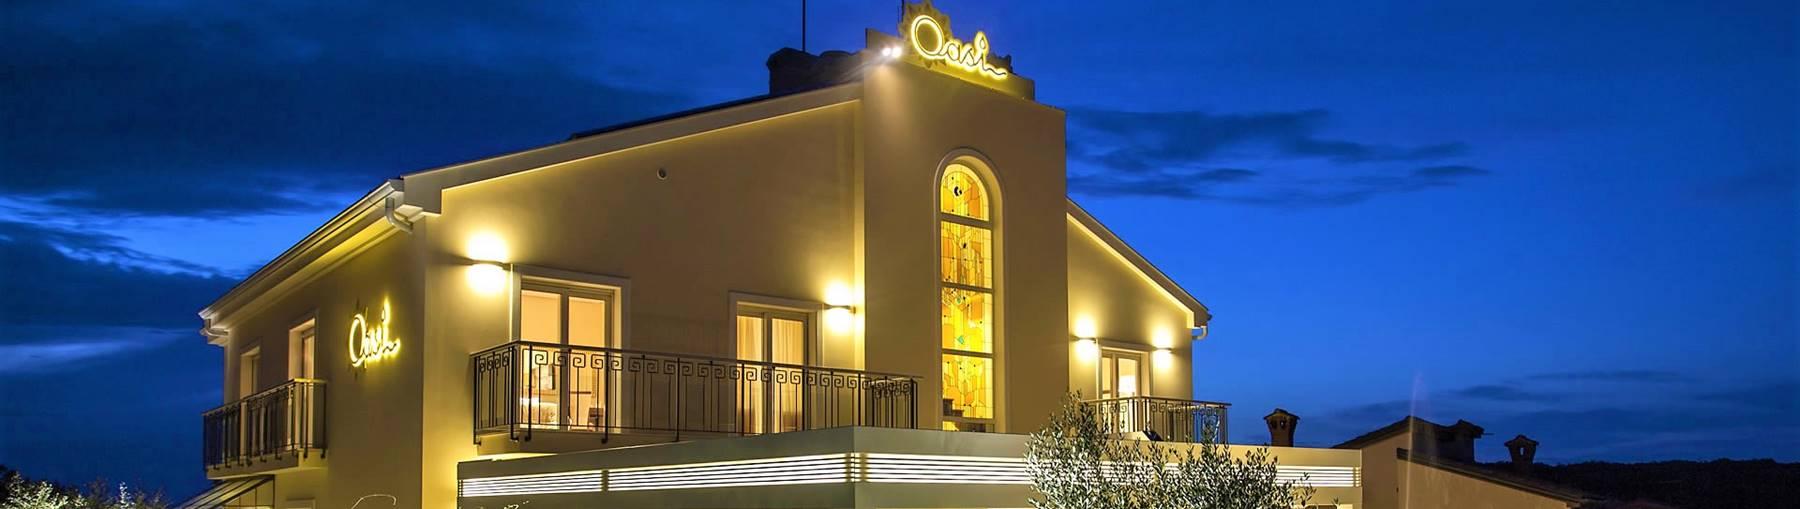 Boutique Hotel Oasi